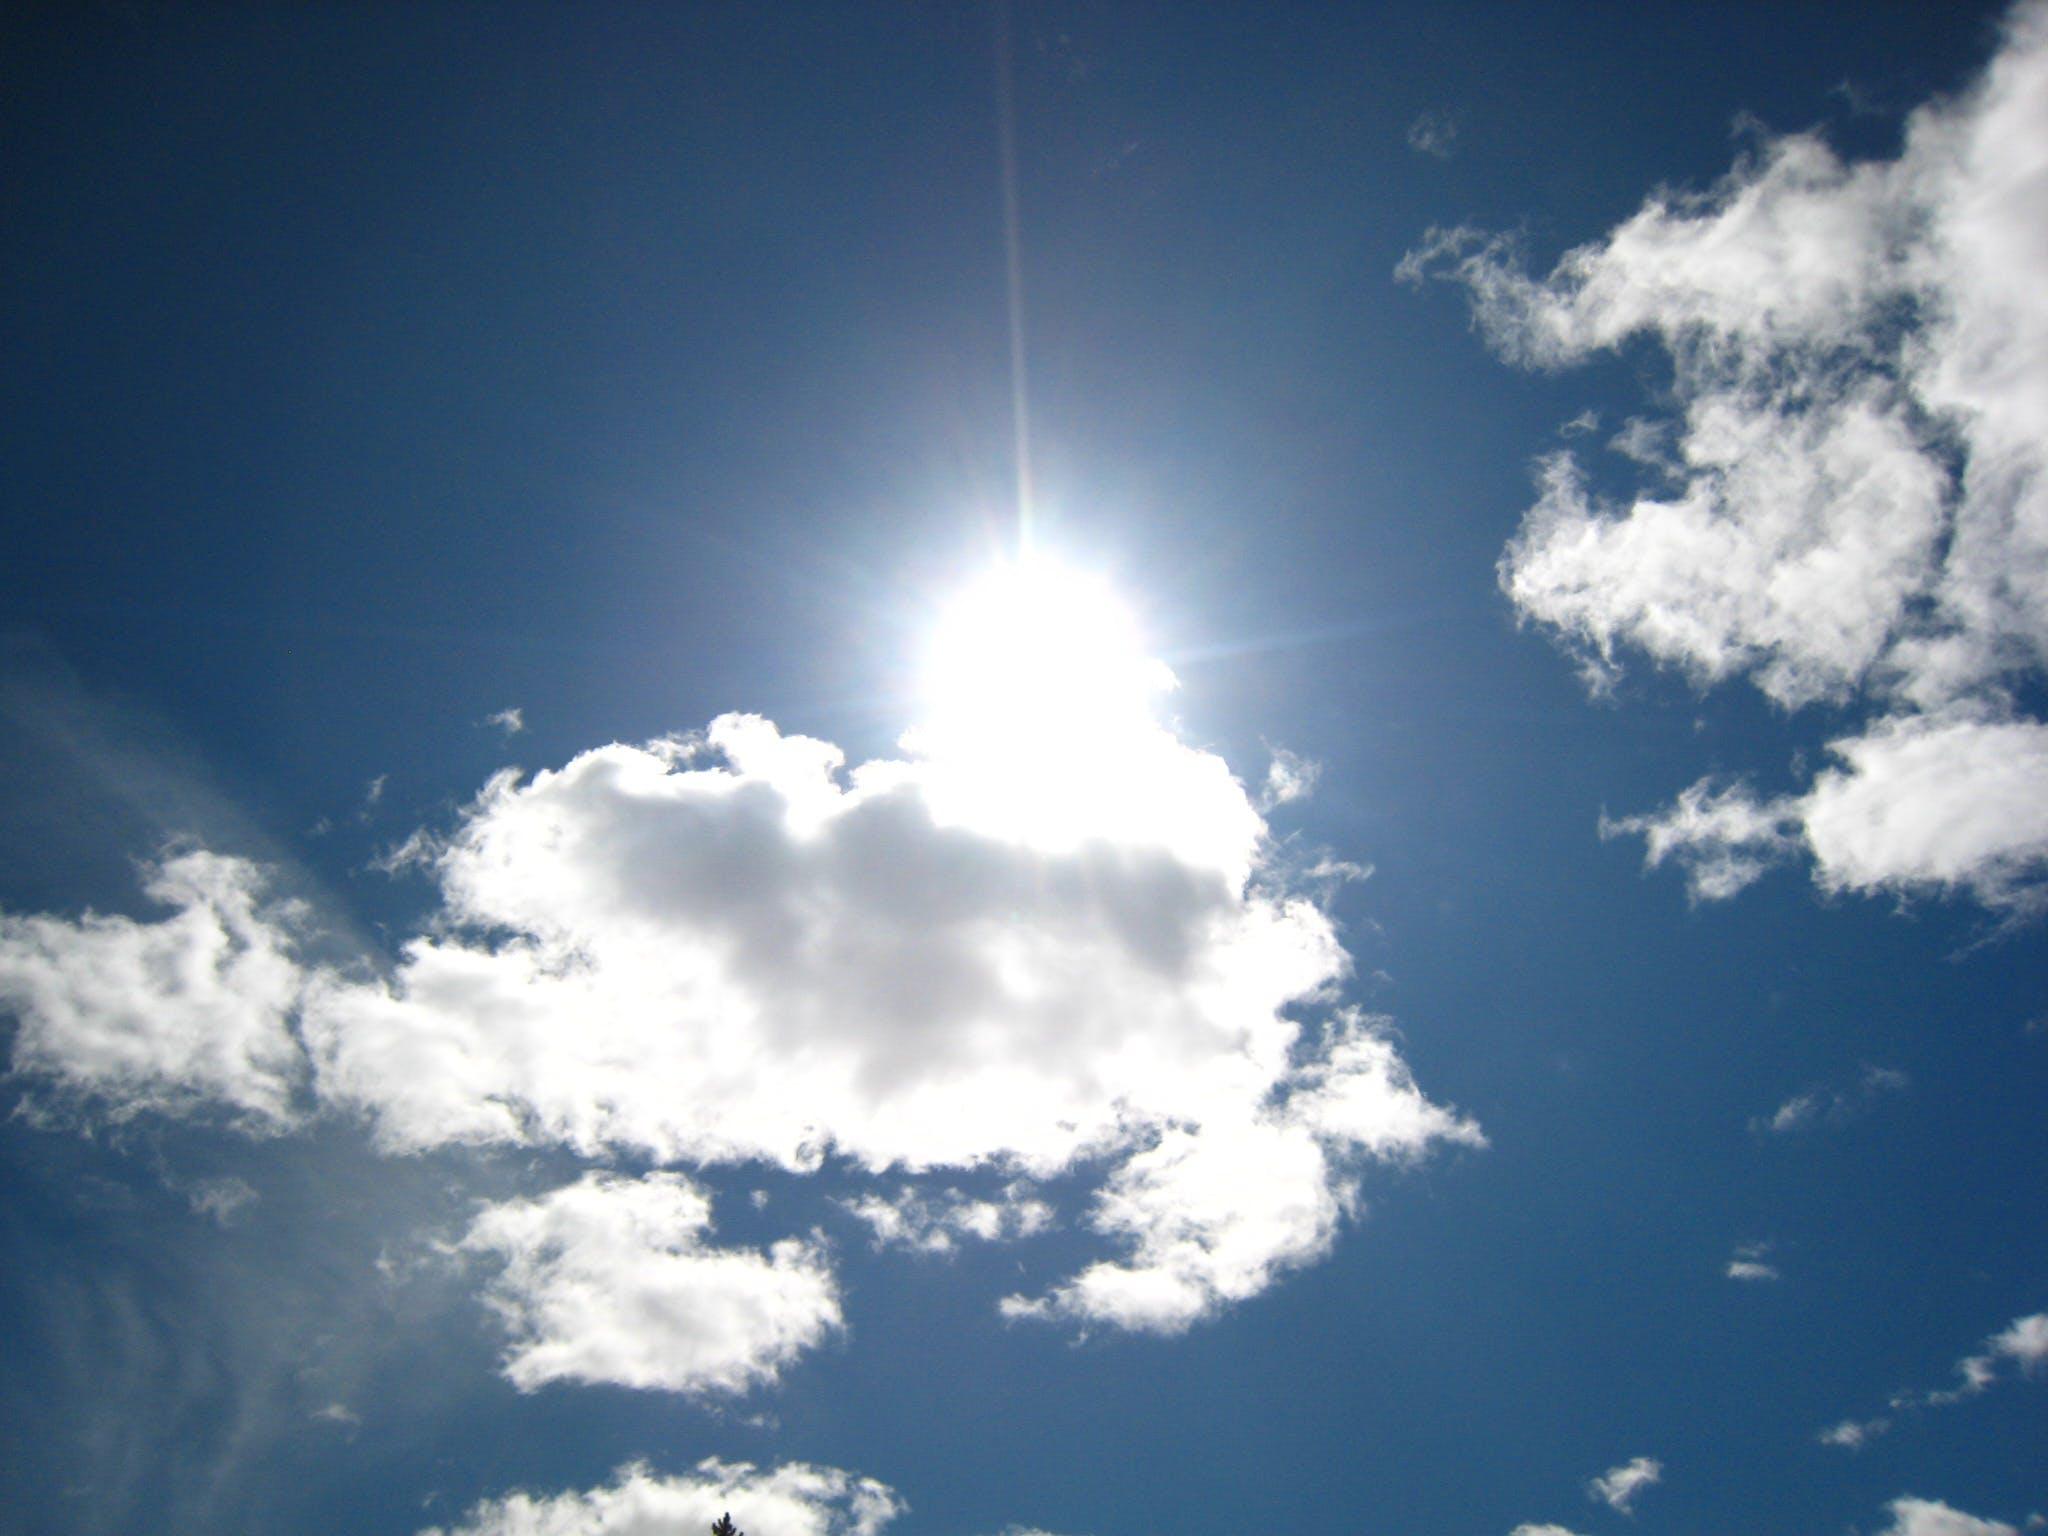 Free stock photo of blue sky, clouds, sun